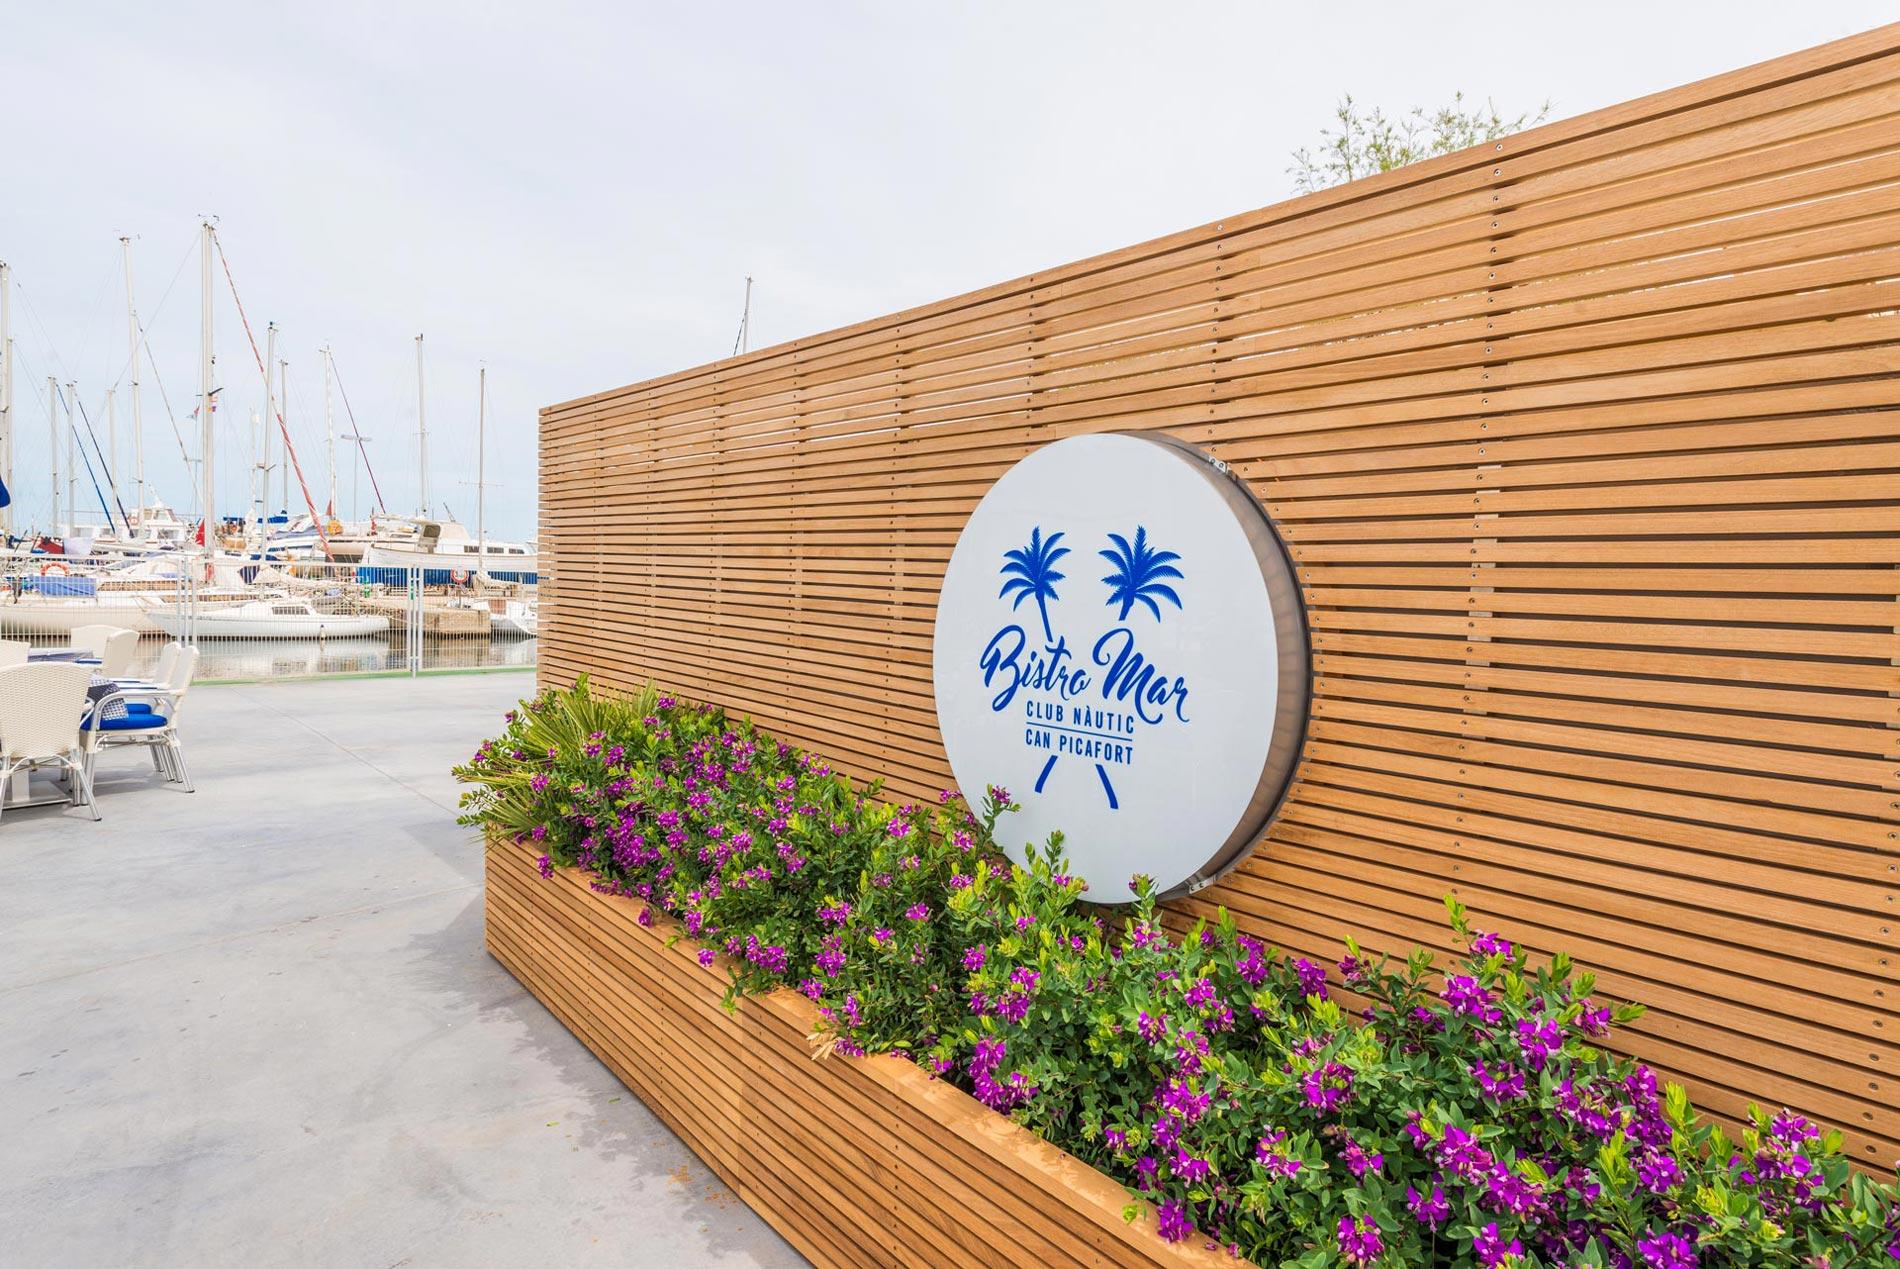 Bistro Mar - Club Nàutic Ca'n Picafort